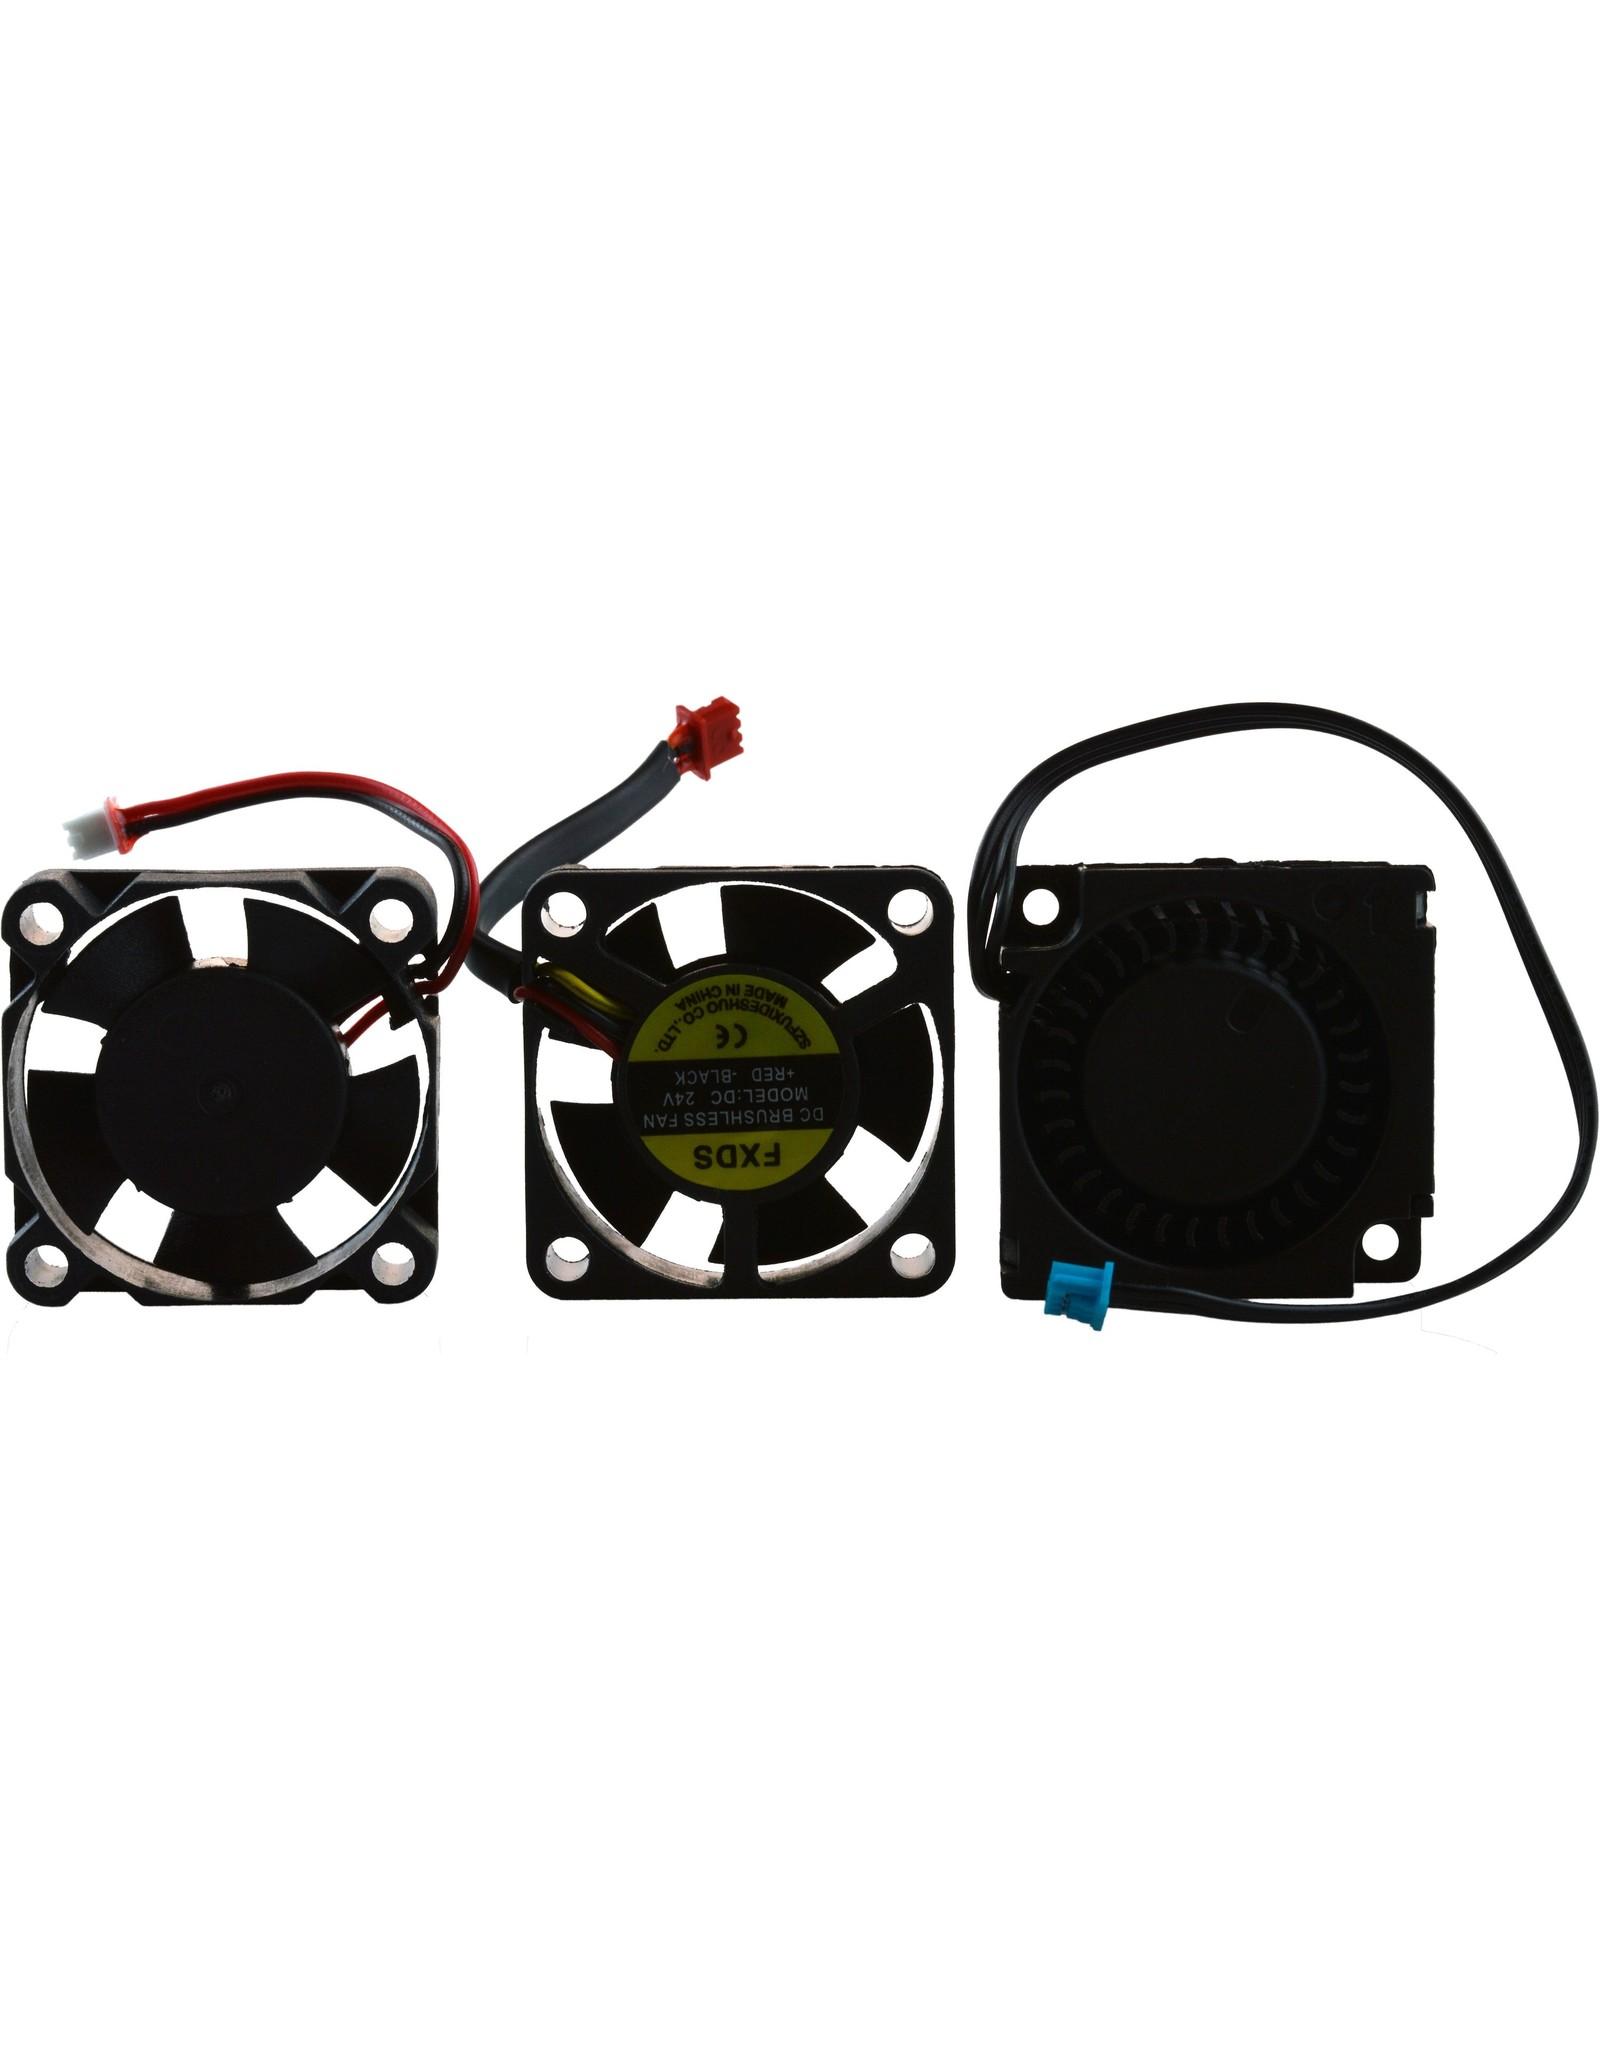 Zortrax Zortrax Fan Cooler 30x30 mm for Inventure / M300 Dual